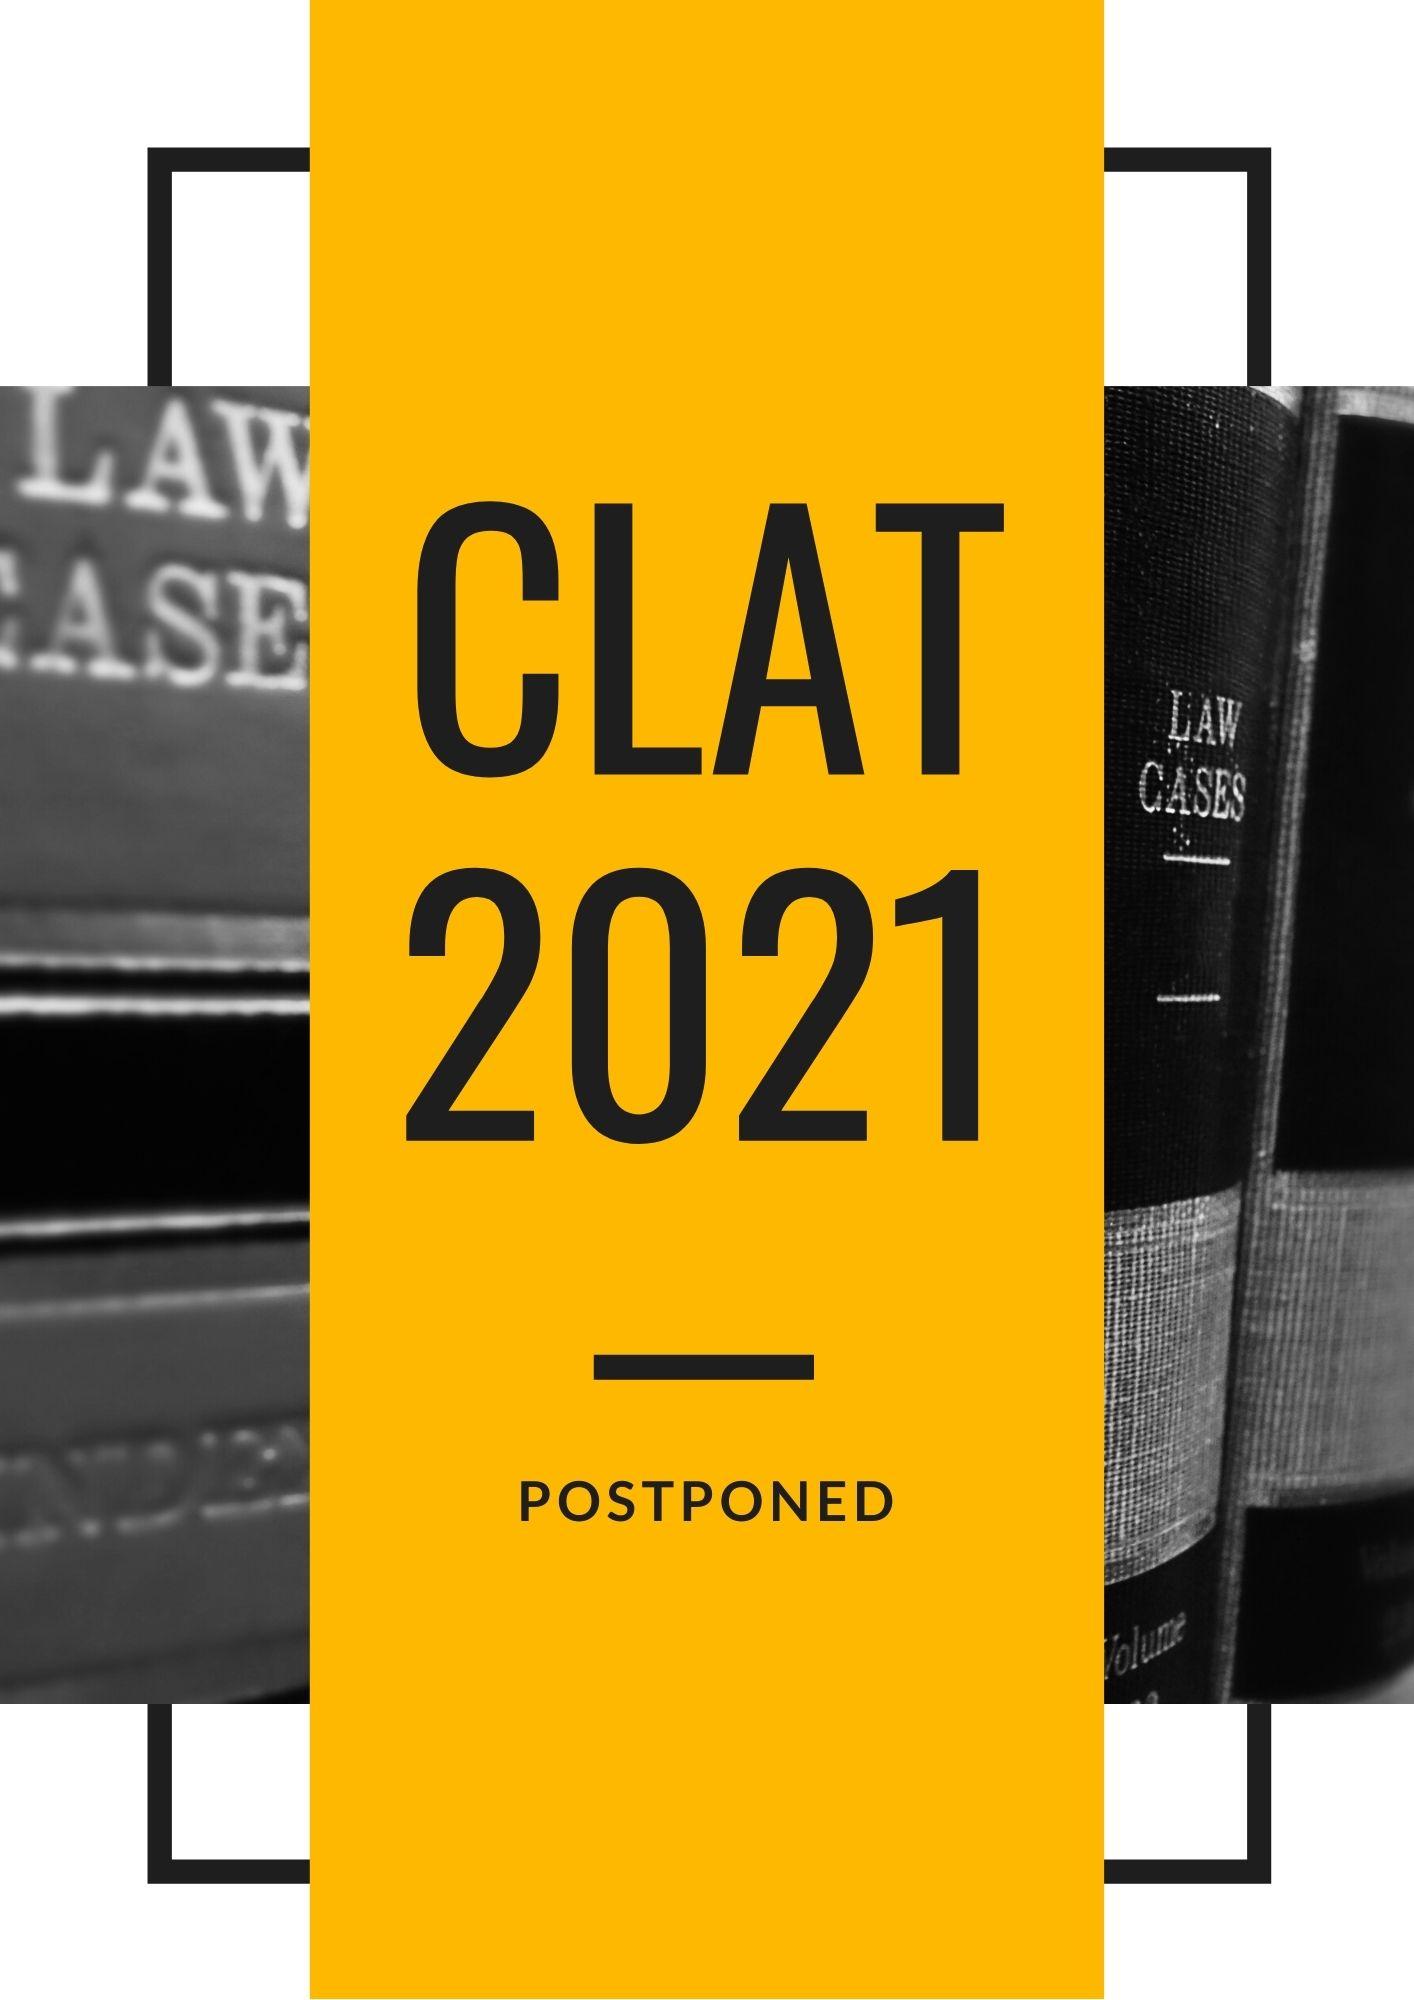 https://www.vidhigya.in/clat 2021 postponed, clat, ailet, clat postponed, new date of clat, best clat coaching